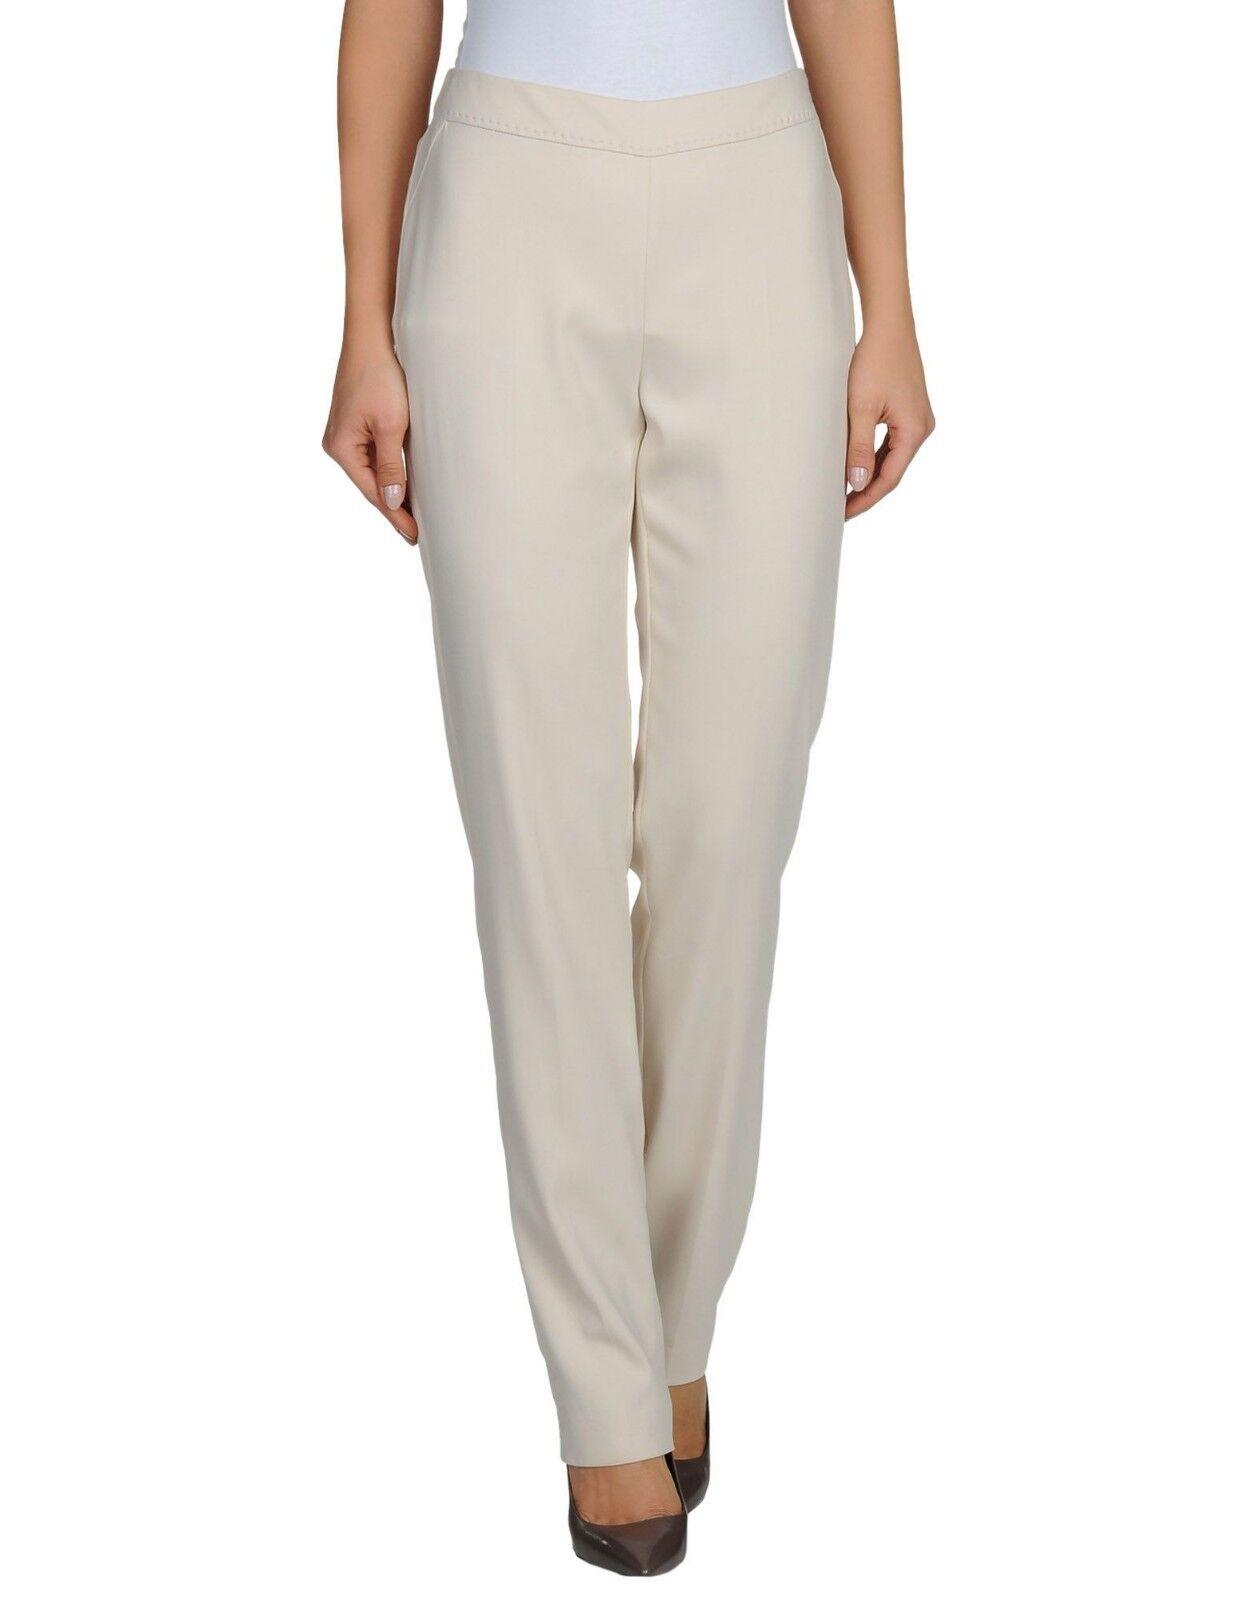 Rena Lange Rare Luxury Viscose Blend Trousers Pants  UK 14